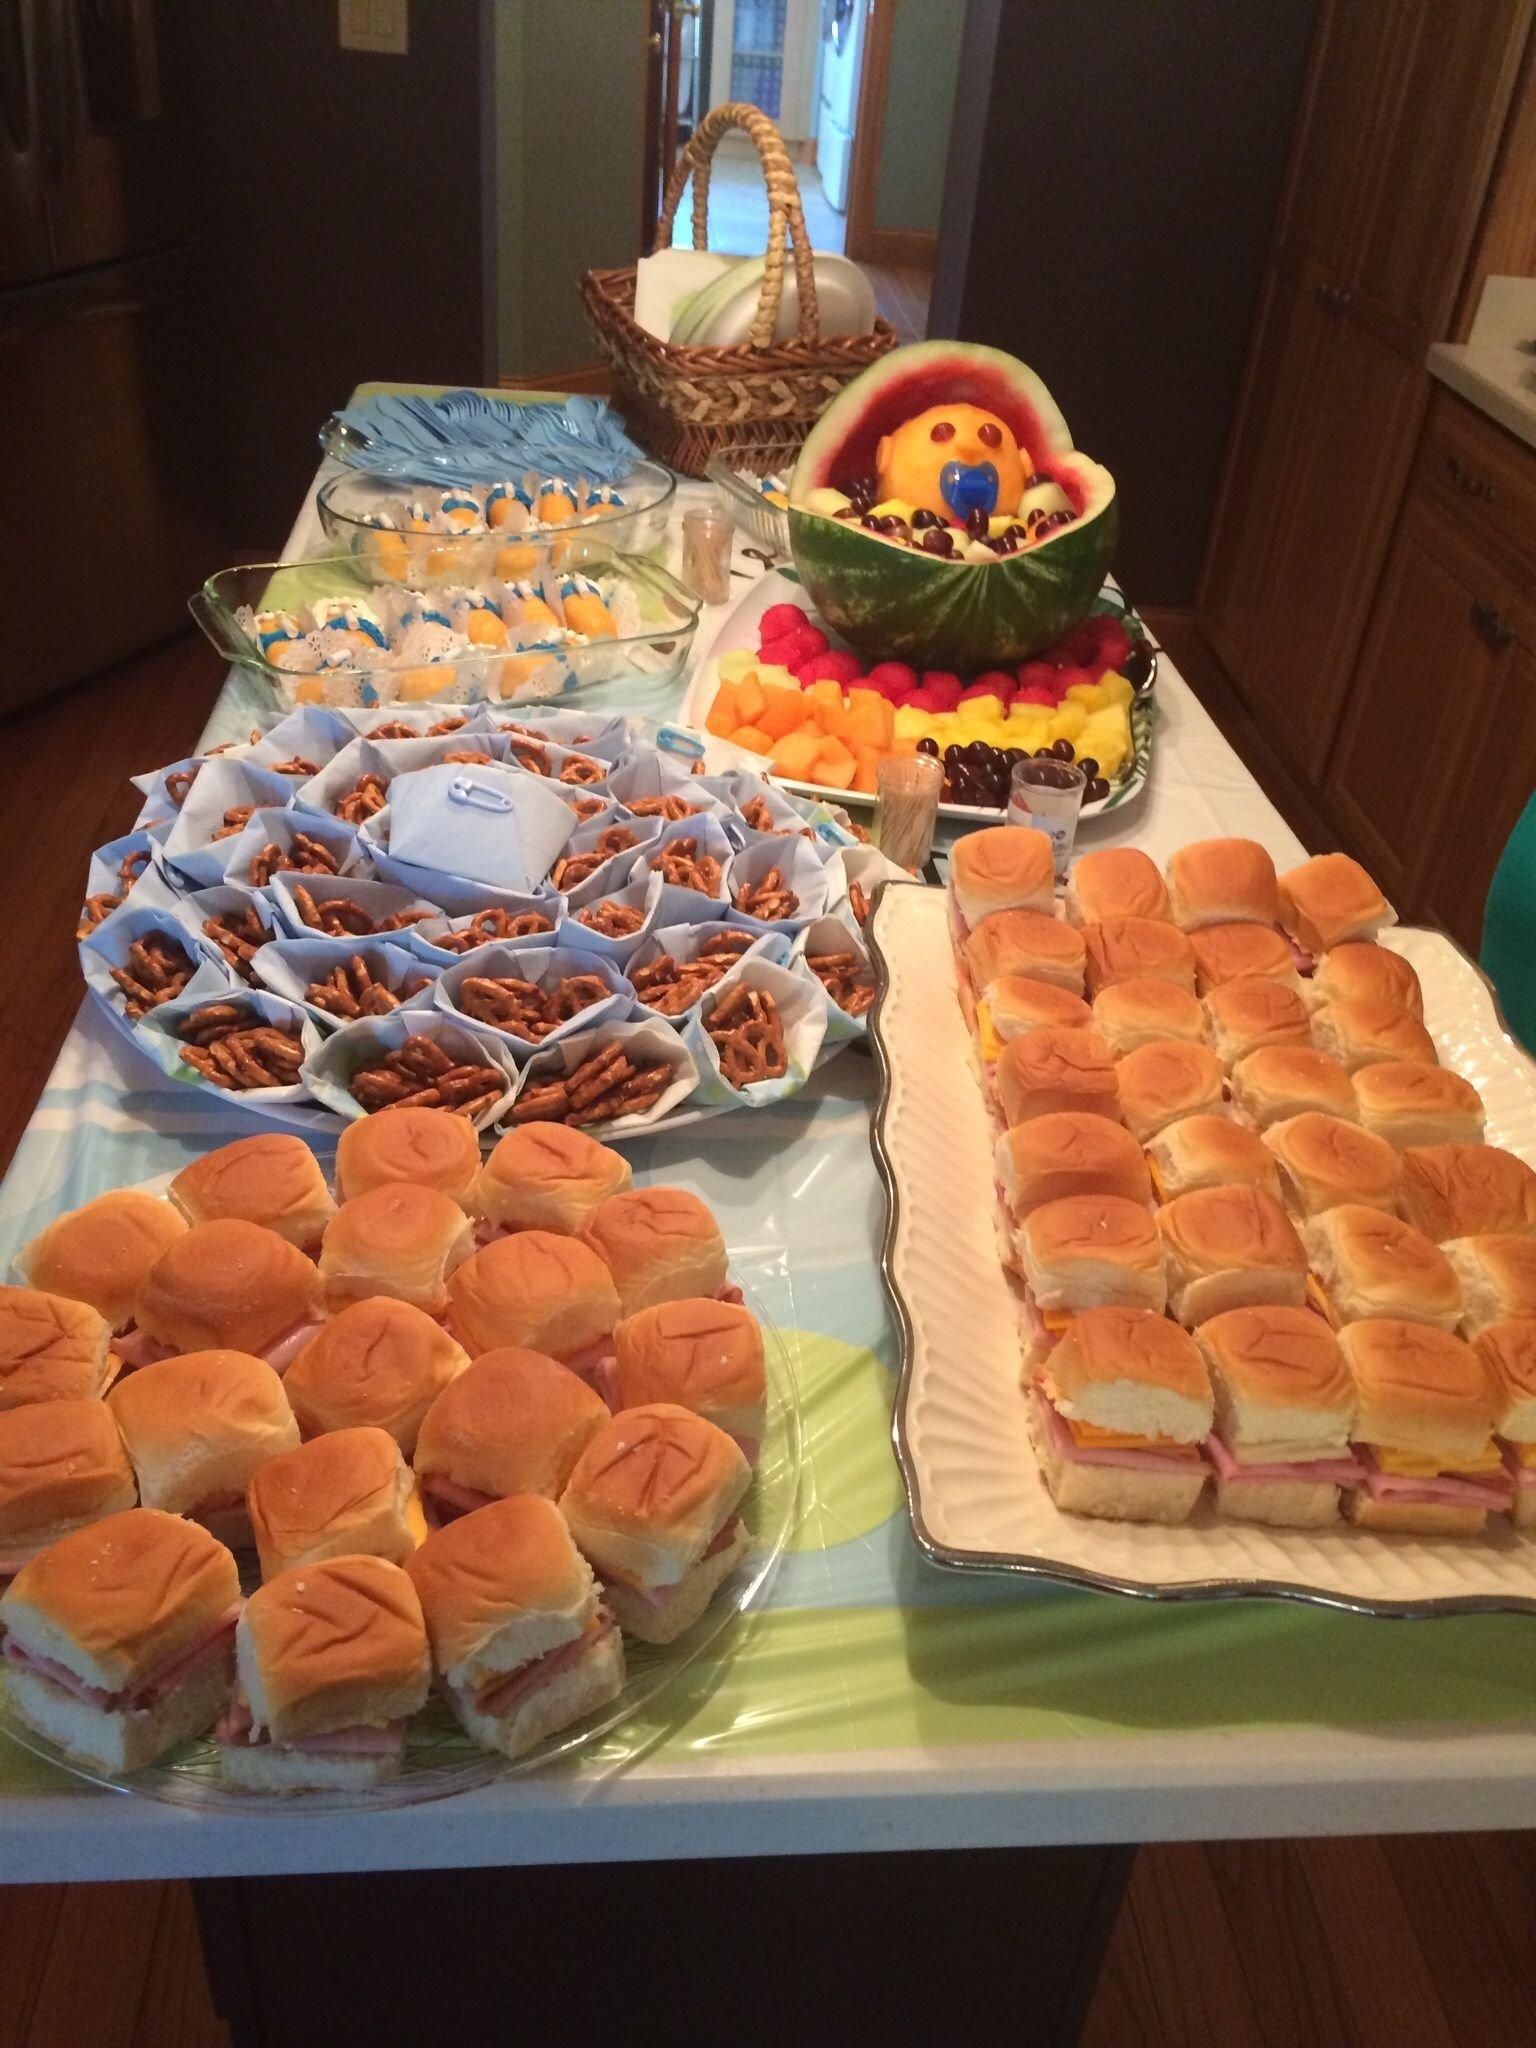 10 Ideal Baby Shower Menu Ideas On A Budget baby shower food on a budget sandwiches on hawaiian rolls pretzel 2020